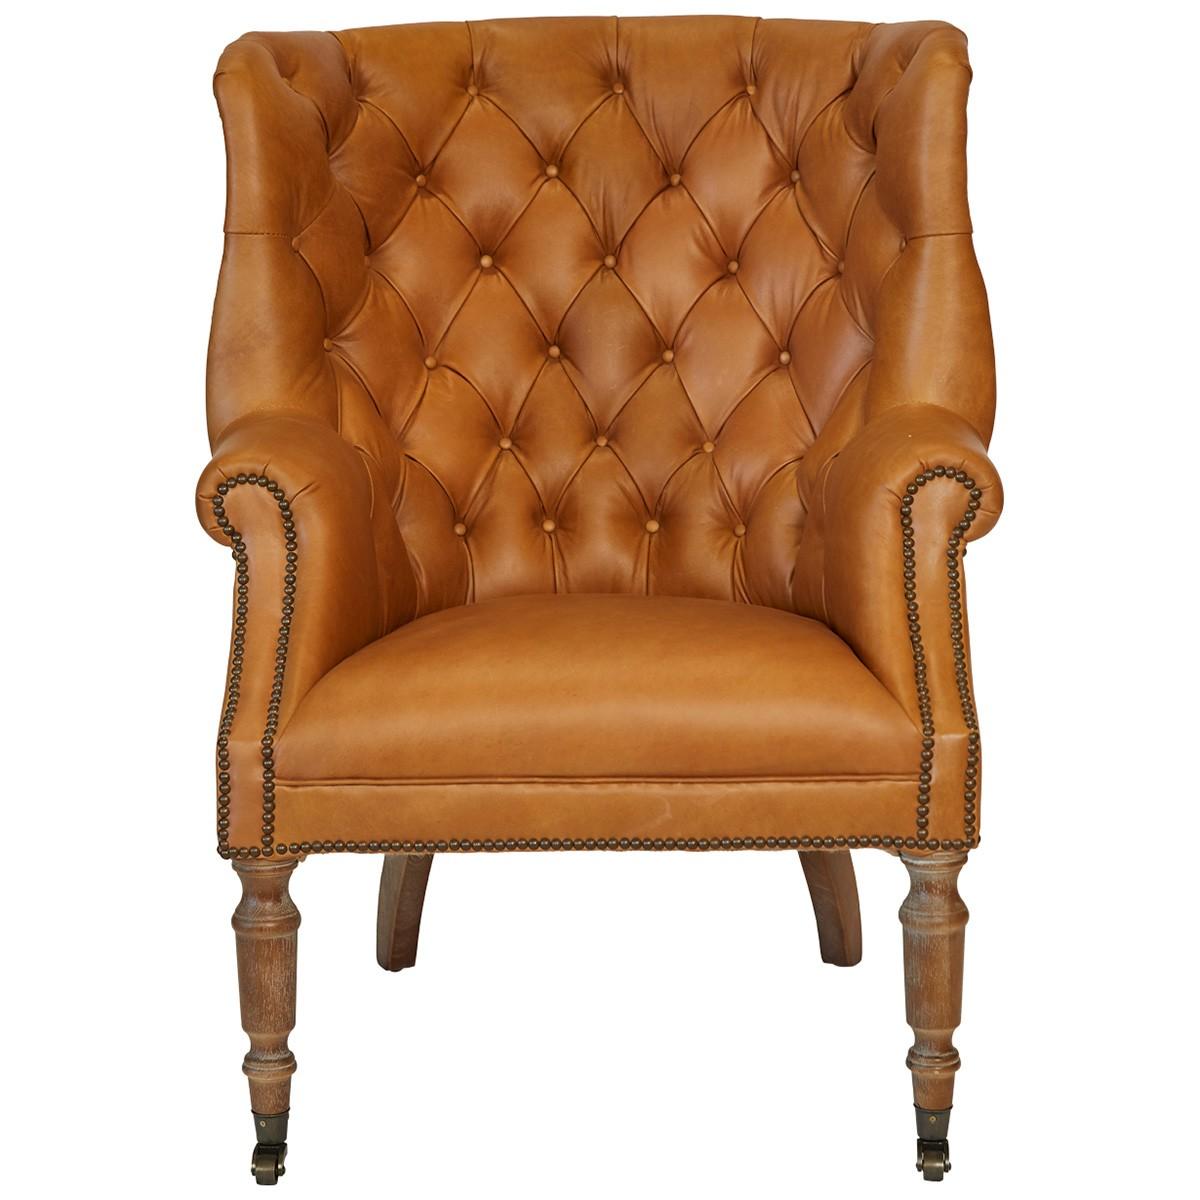 Gerrard Top Grain Leather Wingback Armchair with Castors, Honey